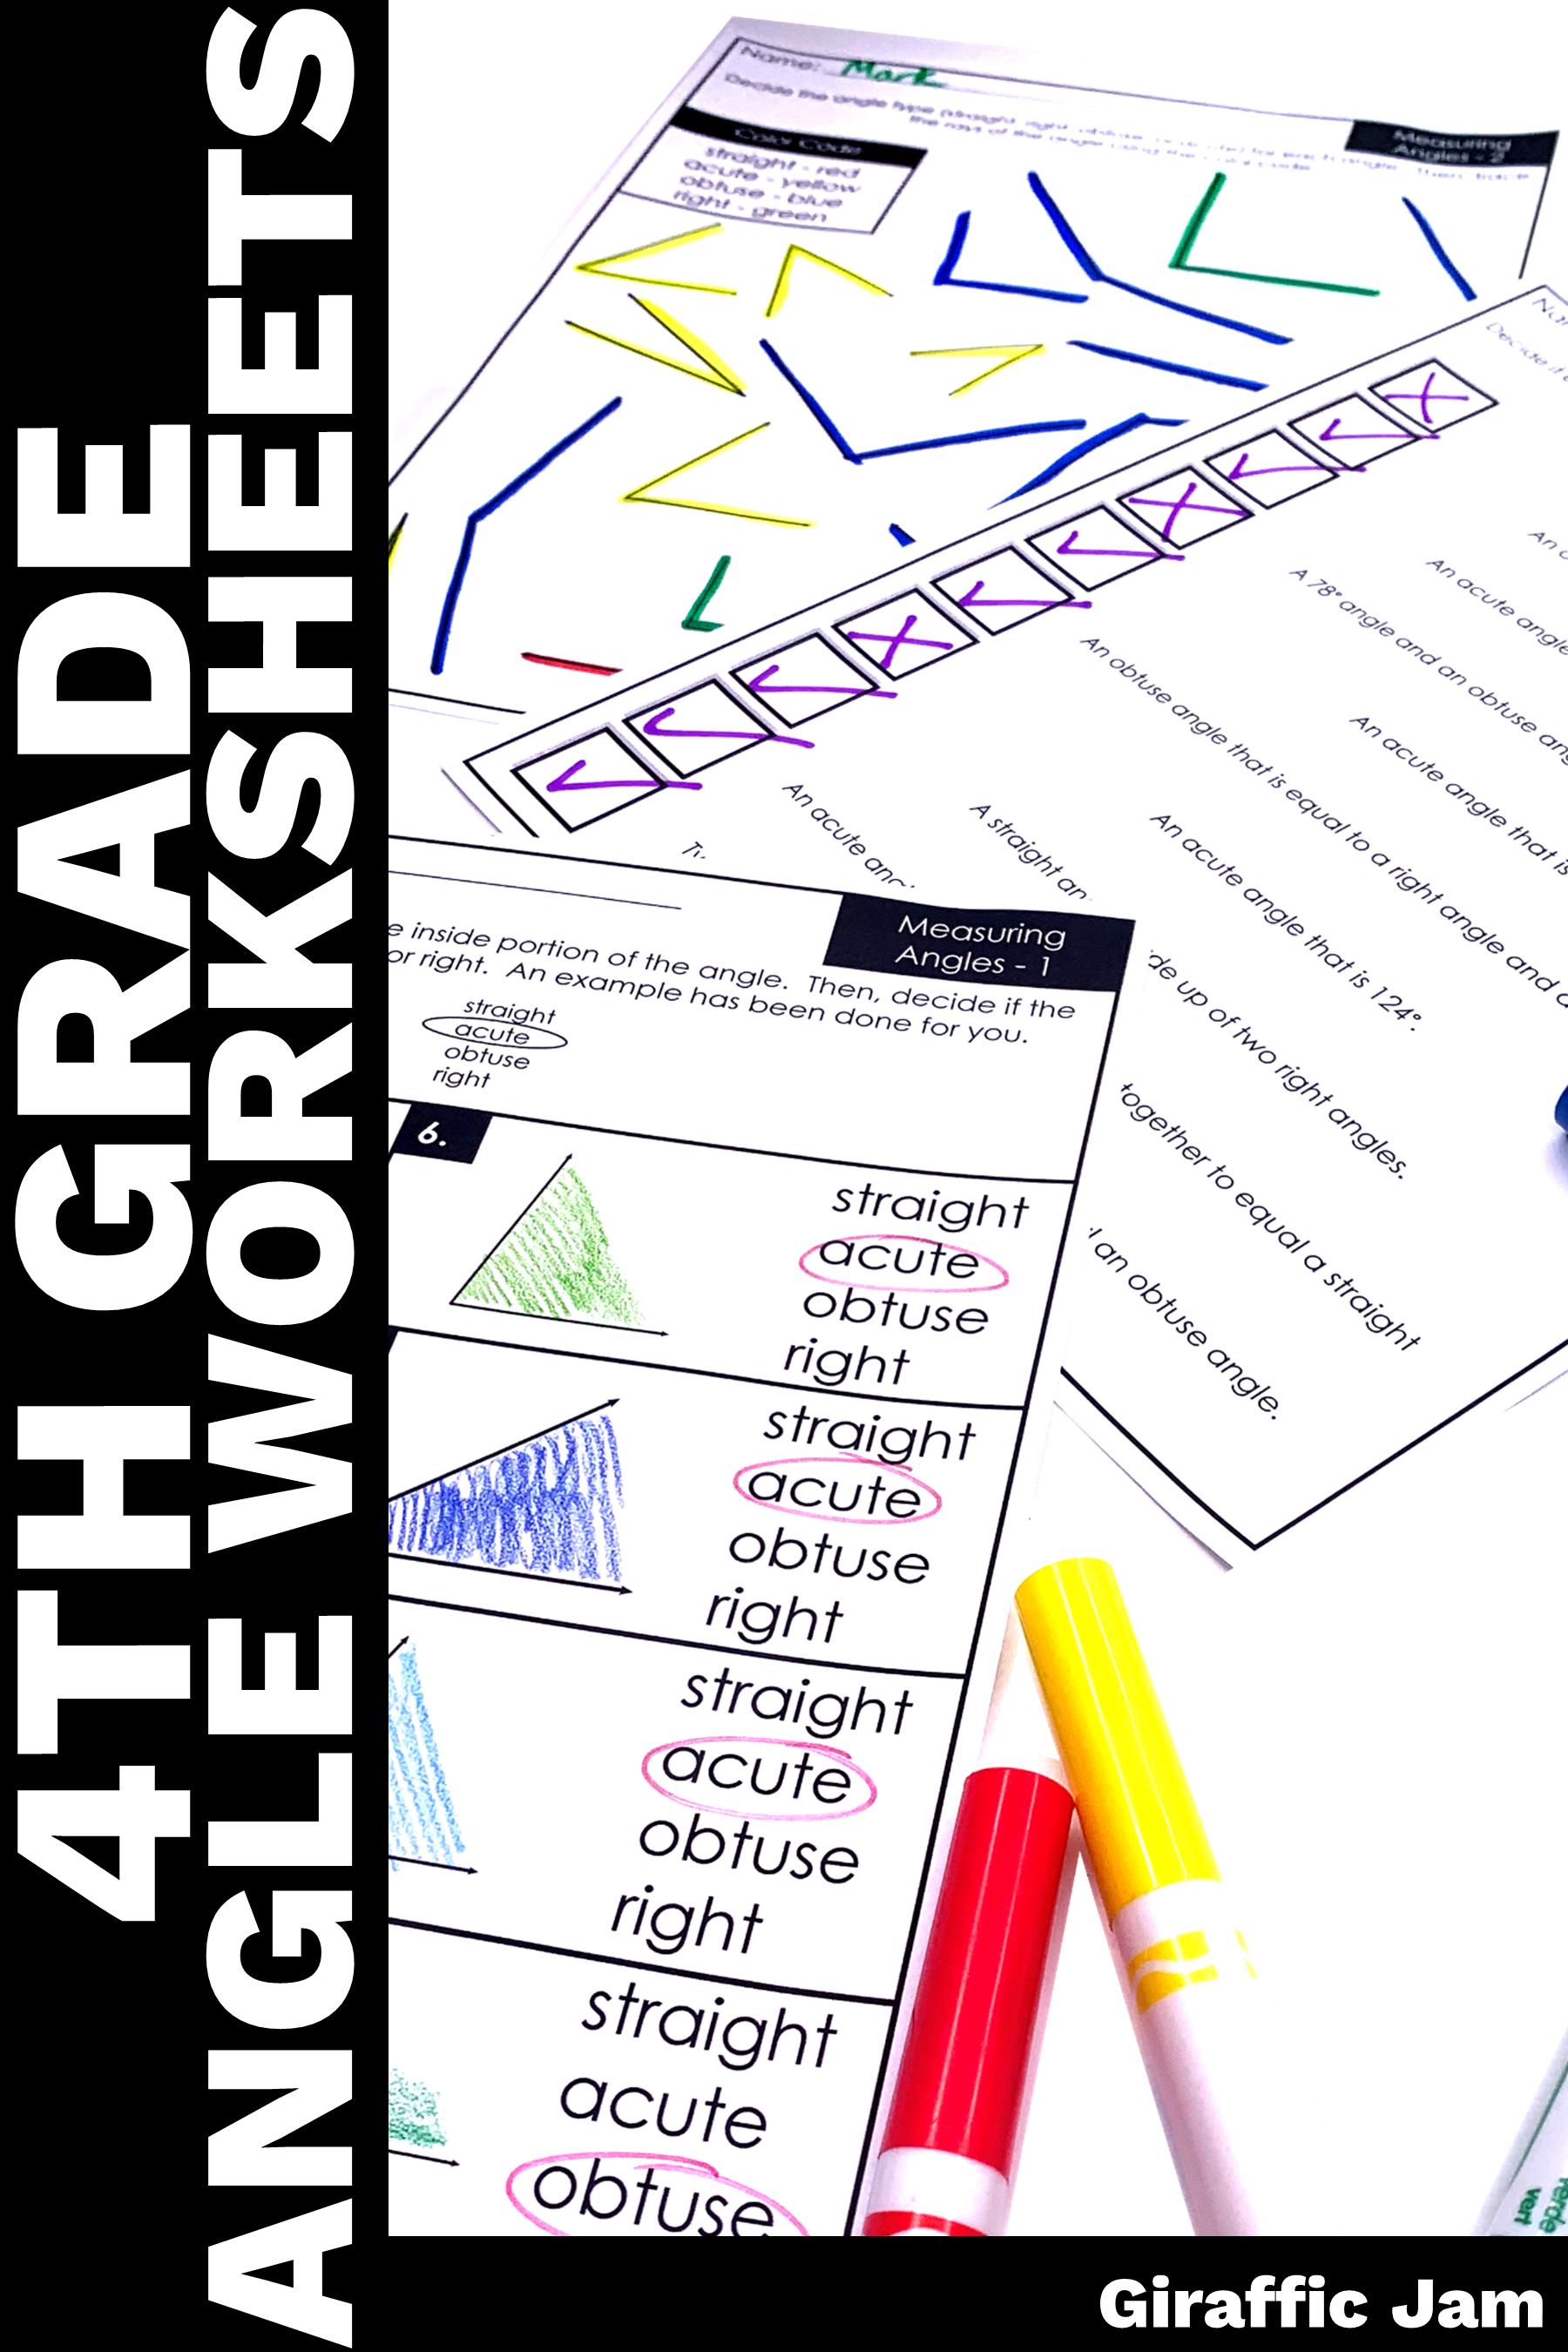 4th Grade Angle Measurement Worksheets With Digital Google Slides Version Measurement Worksheets Google Classroom Activities Measurement Homework [ 2700 x 1800 Pixel ]